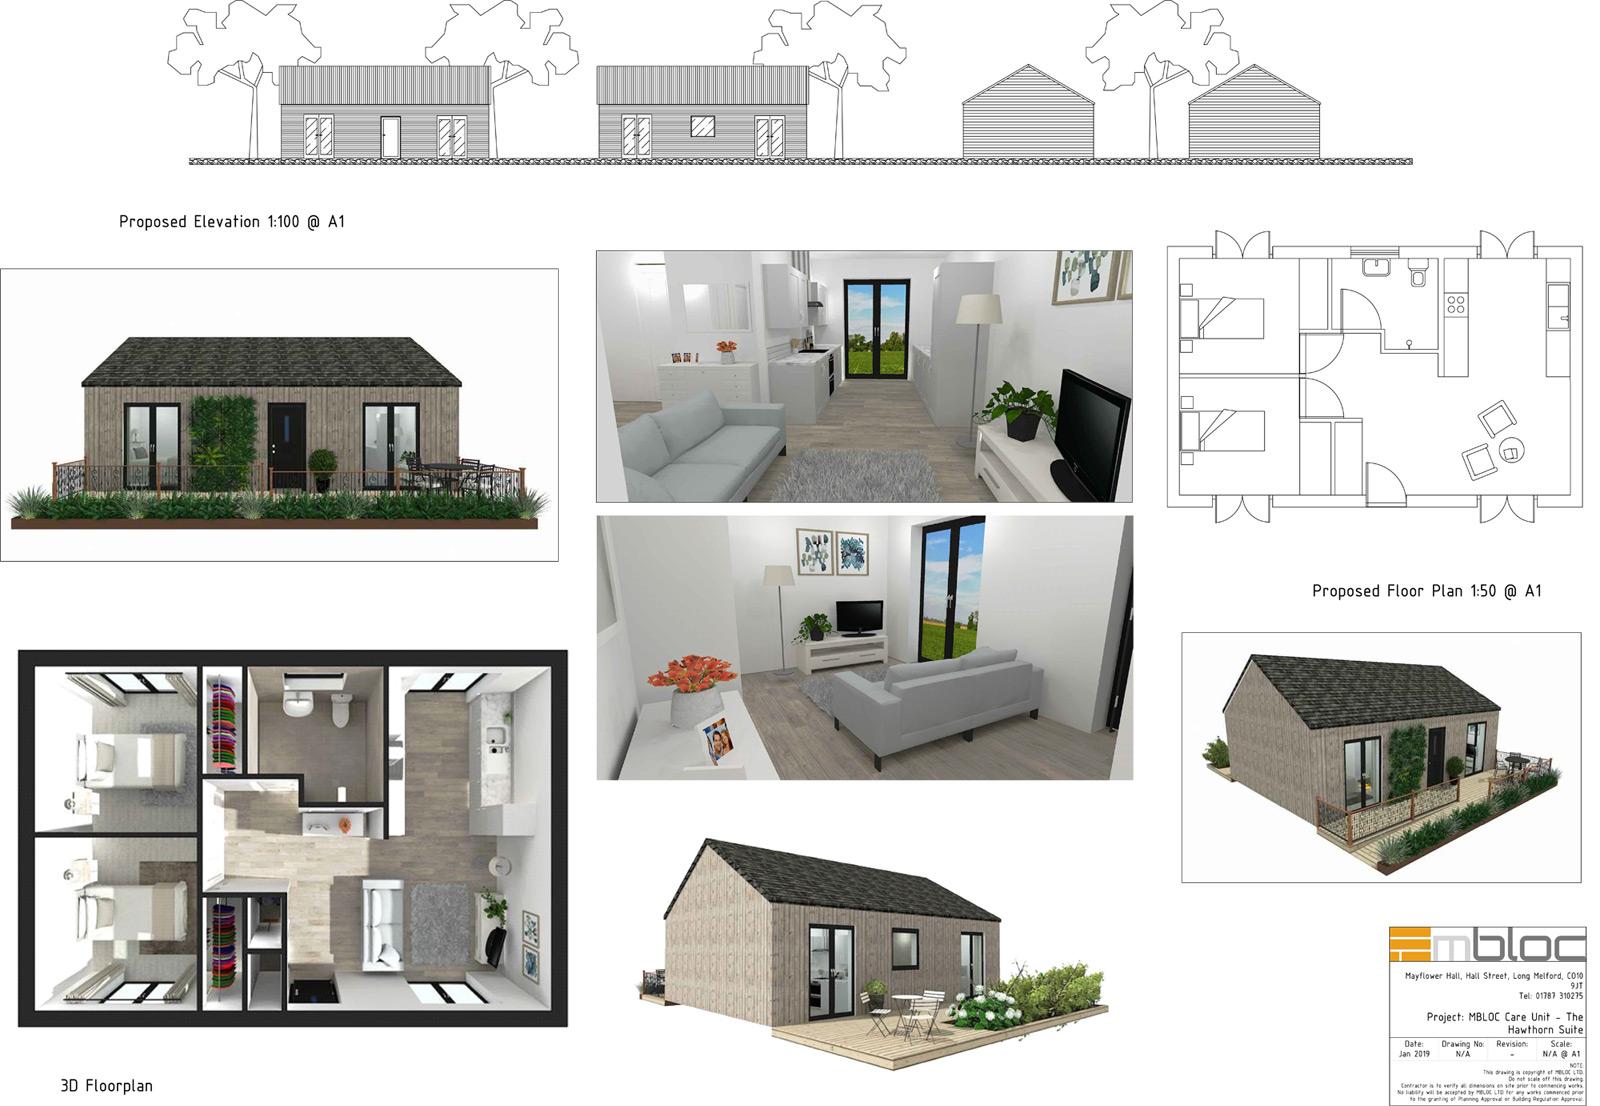 The-Hawthorne-Suite.jpg